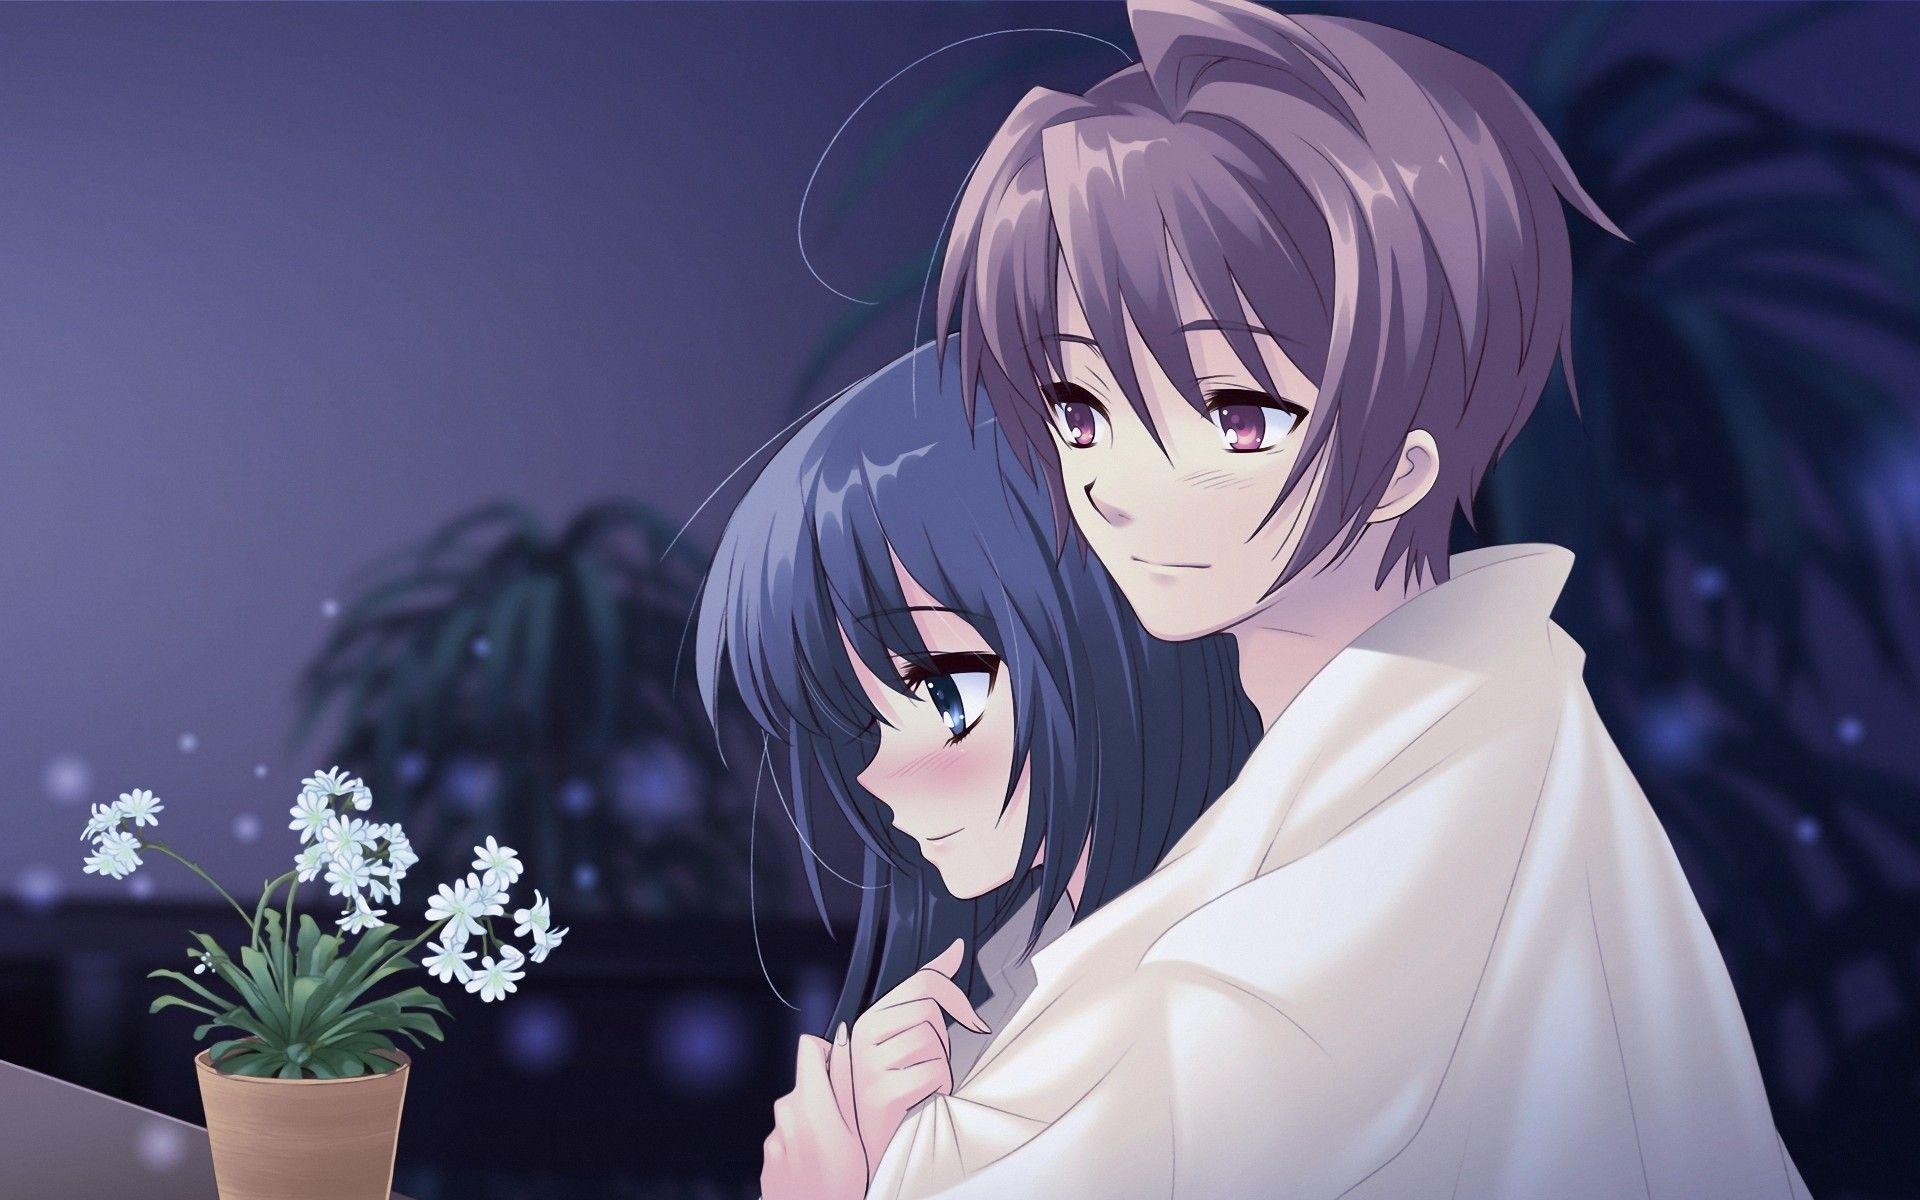 Cute Anime Couple Love Wallpaper 1920x1200 Anime love